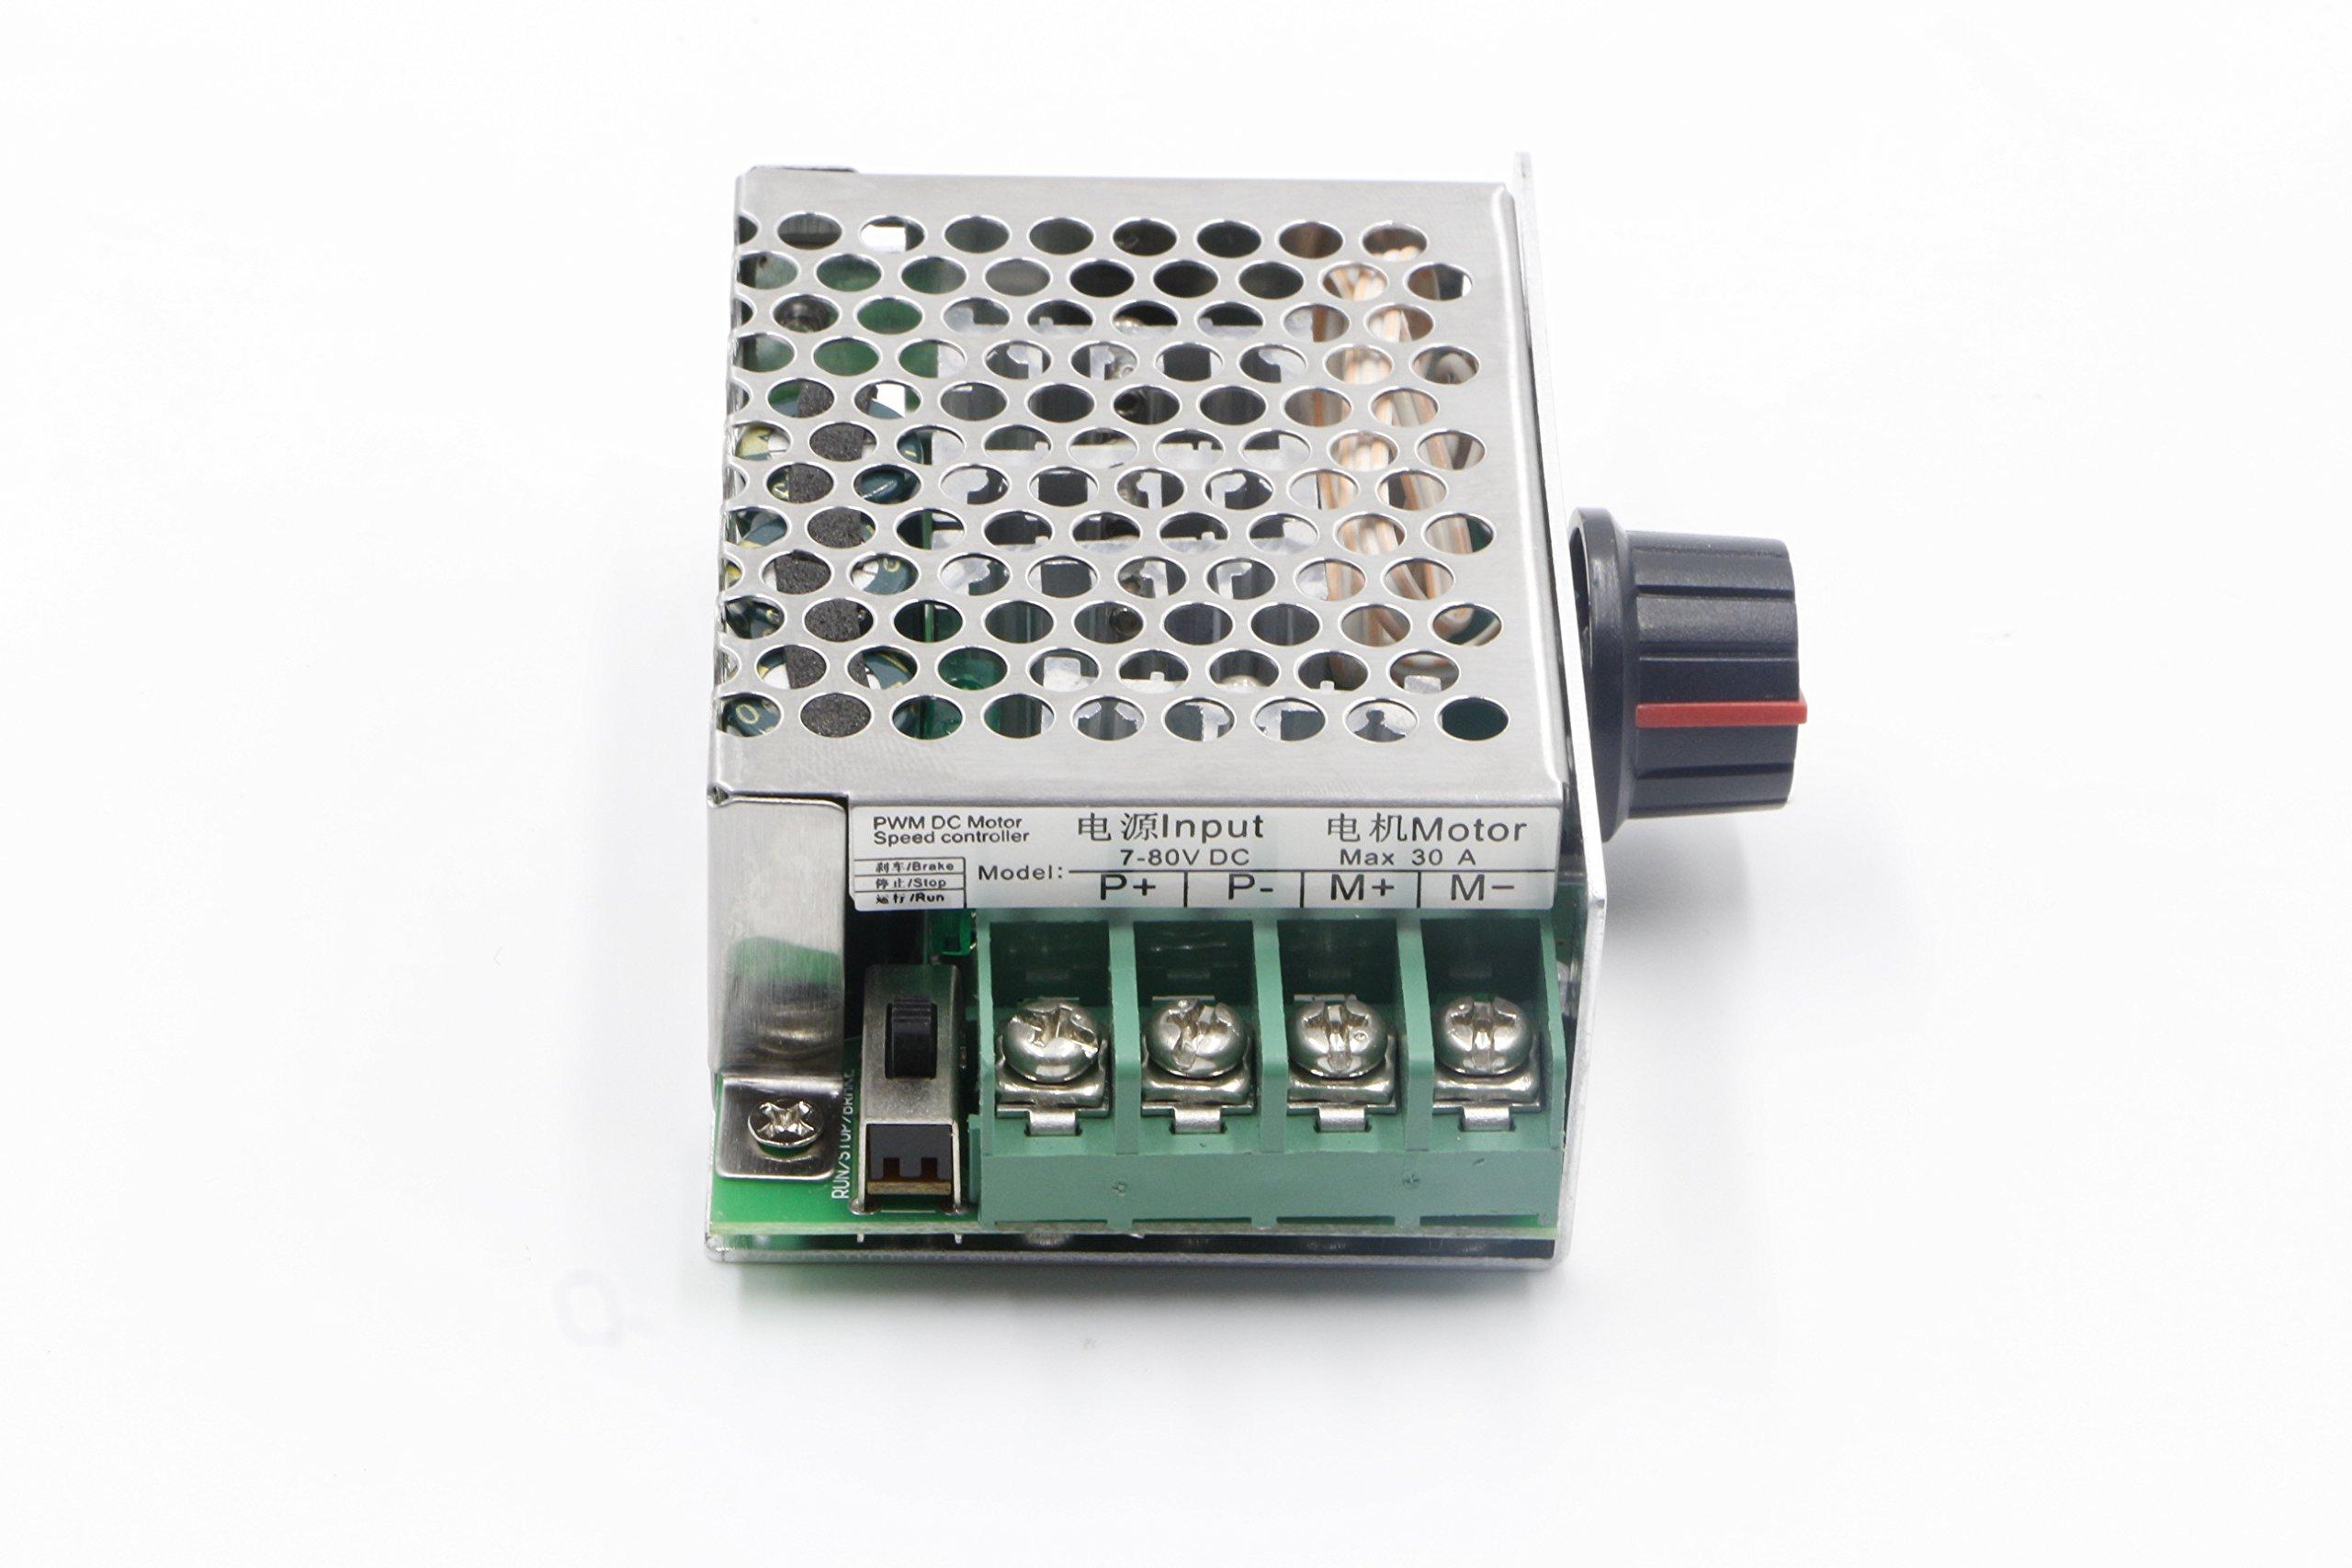 RioRand 7-80V PWM DC Motor Speed Controller Switch 30A - RR-MJLK ...